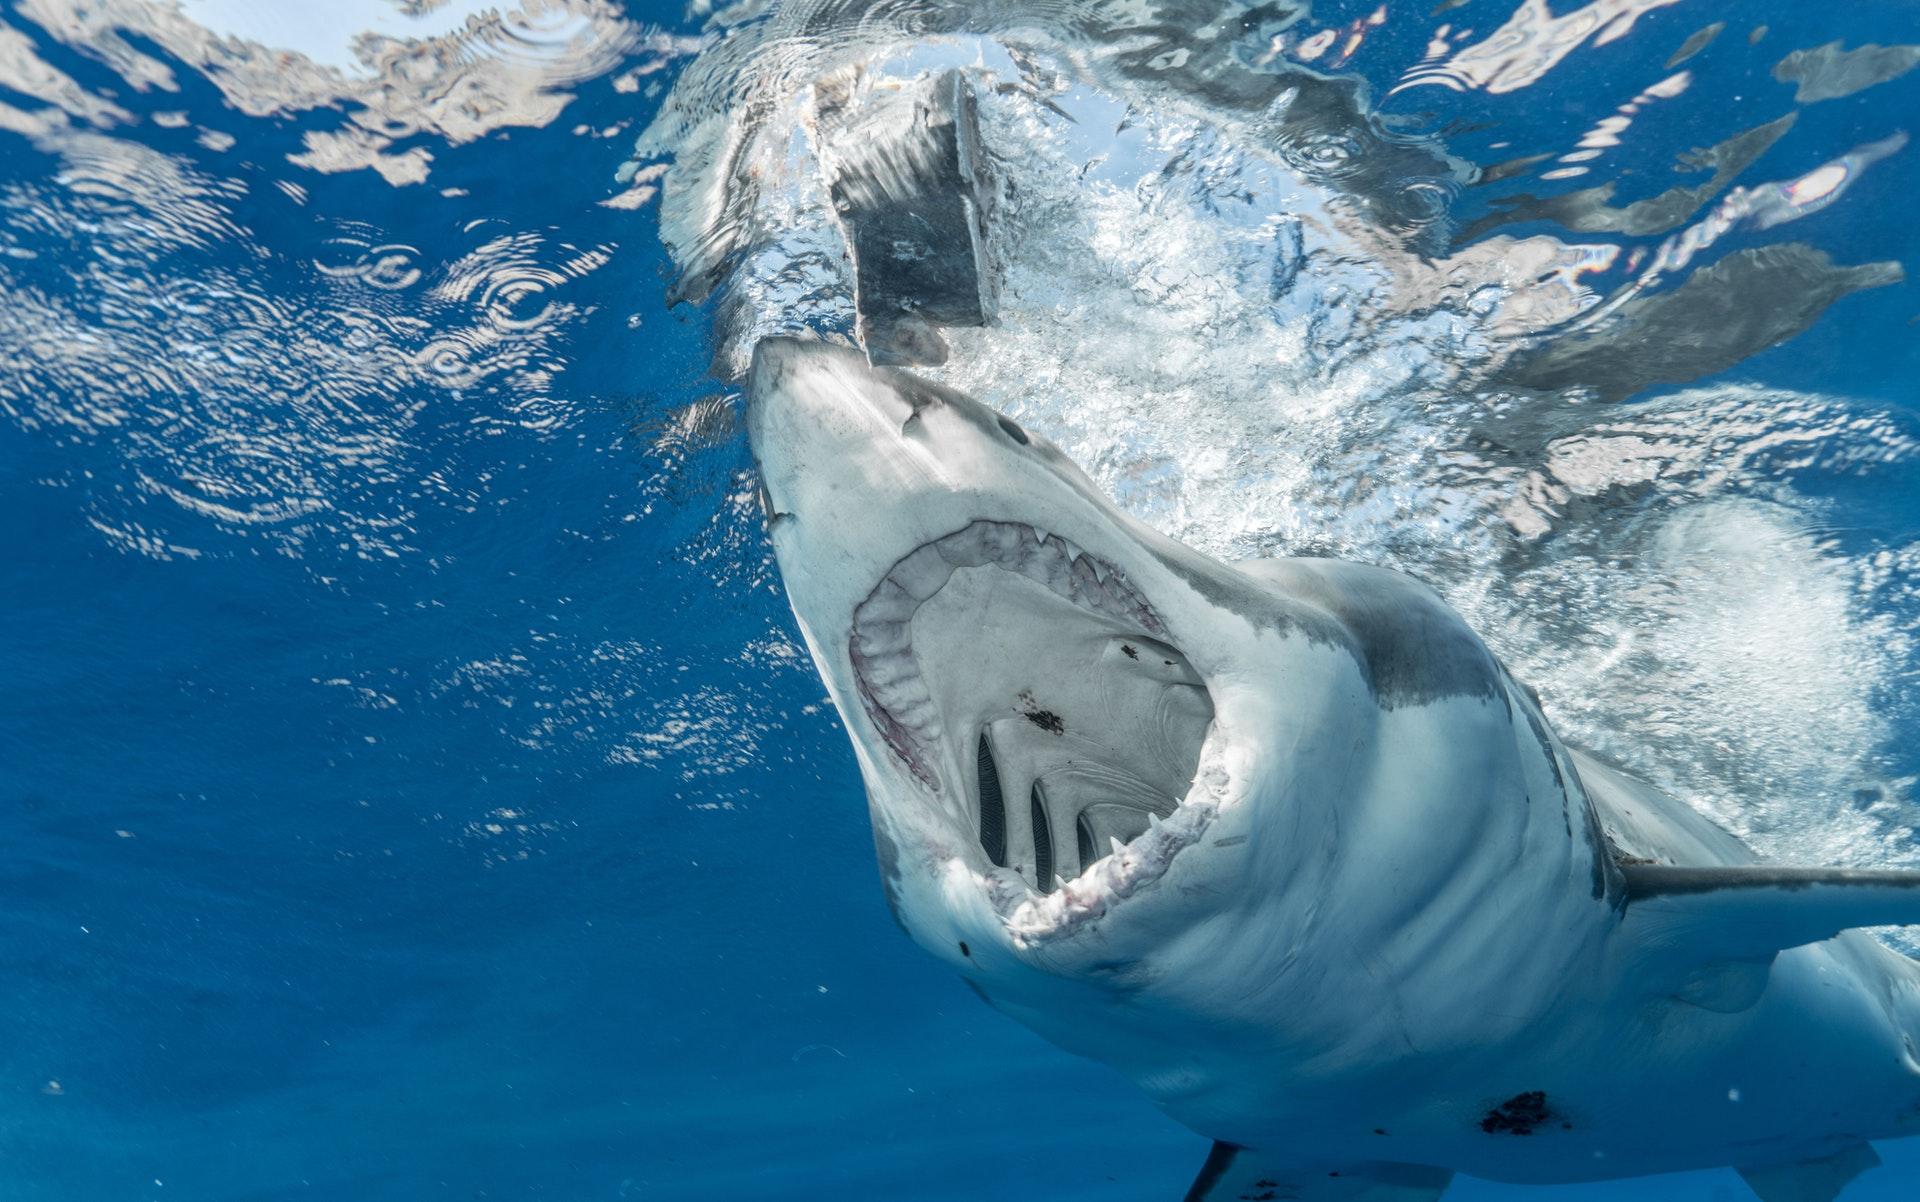 What do sharks eat